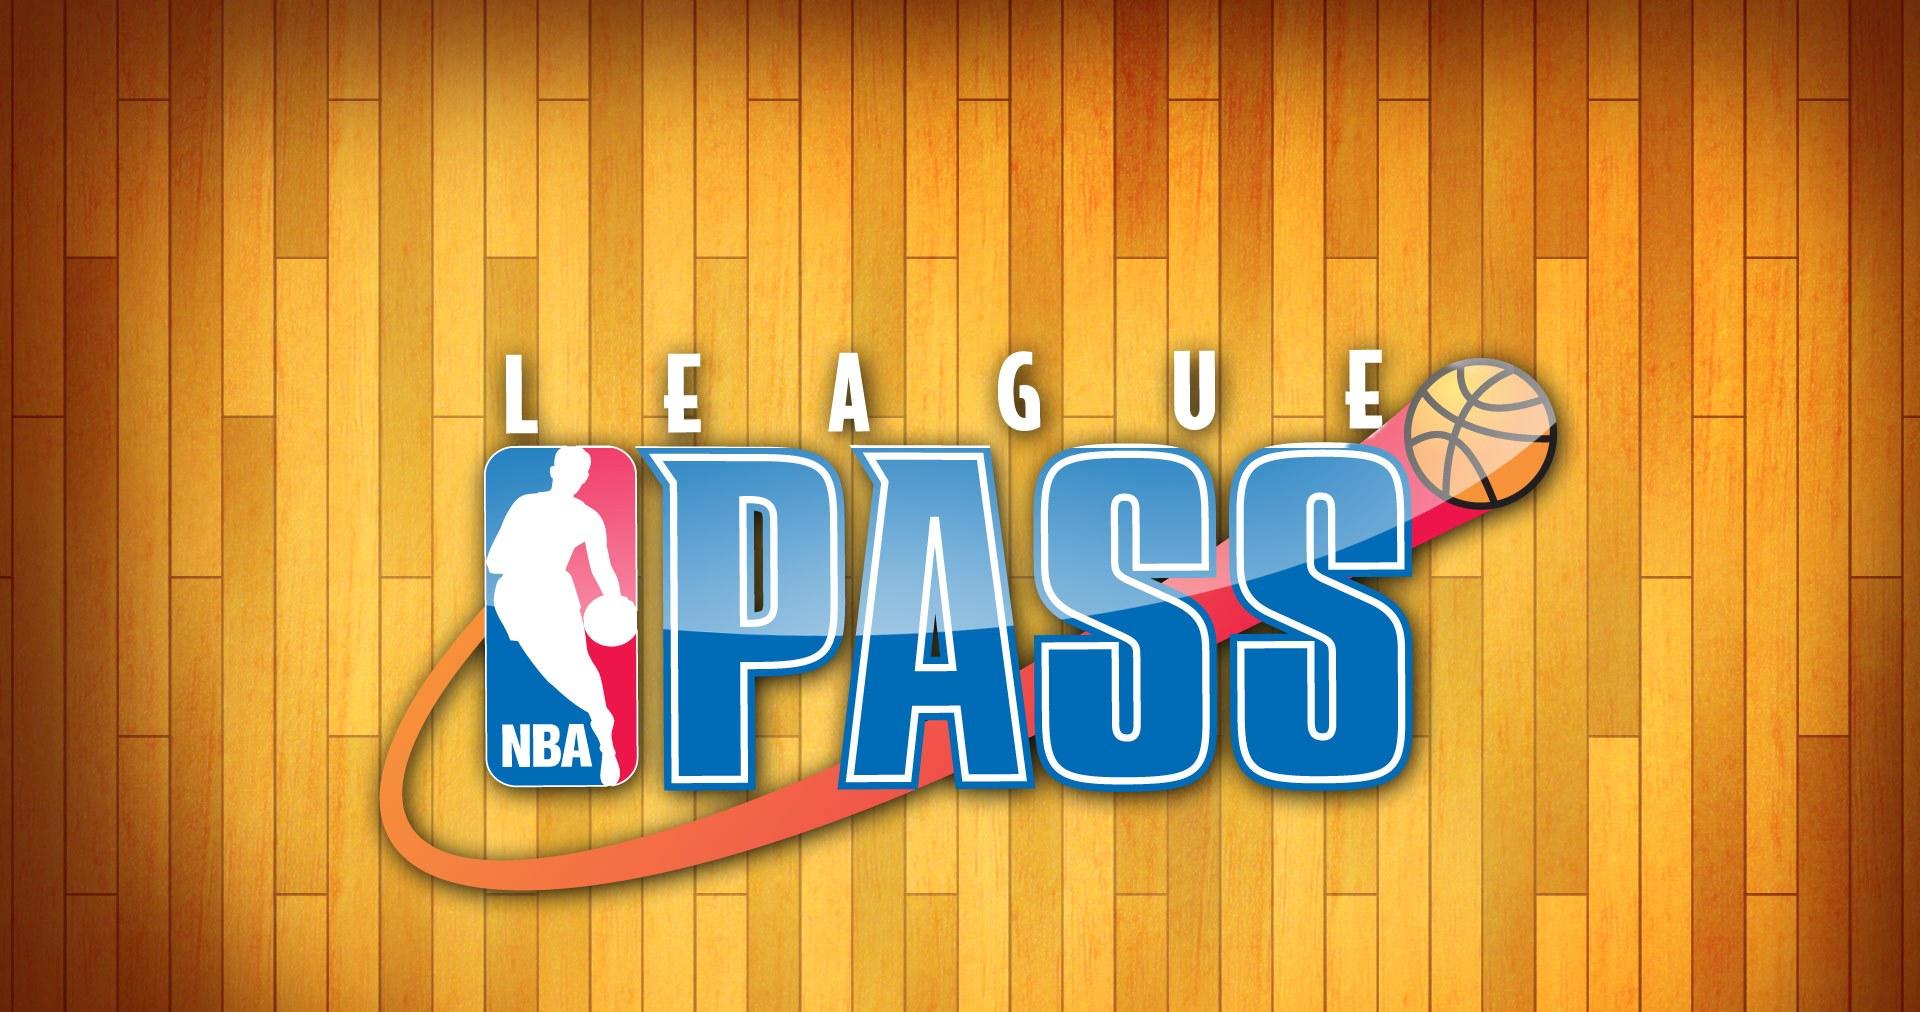 Watch NBA Live Online - Get NBA Full Season Game Pass Free